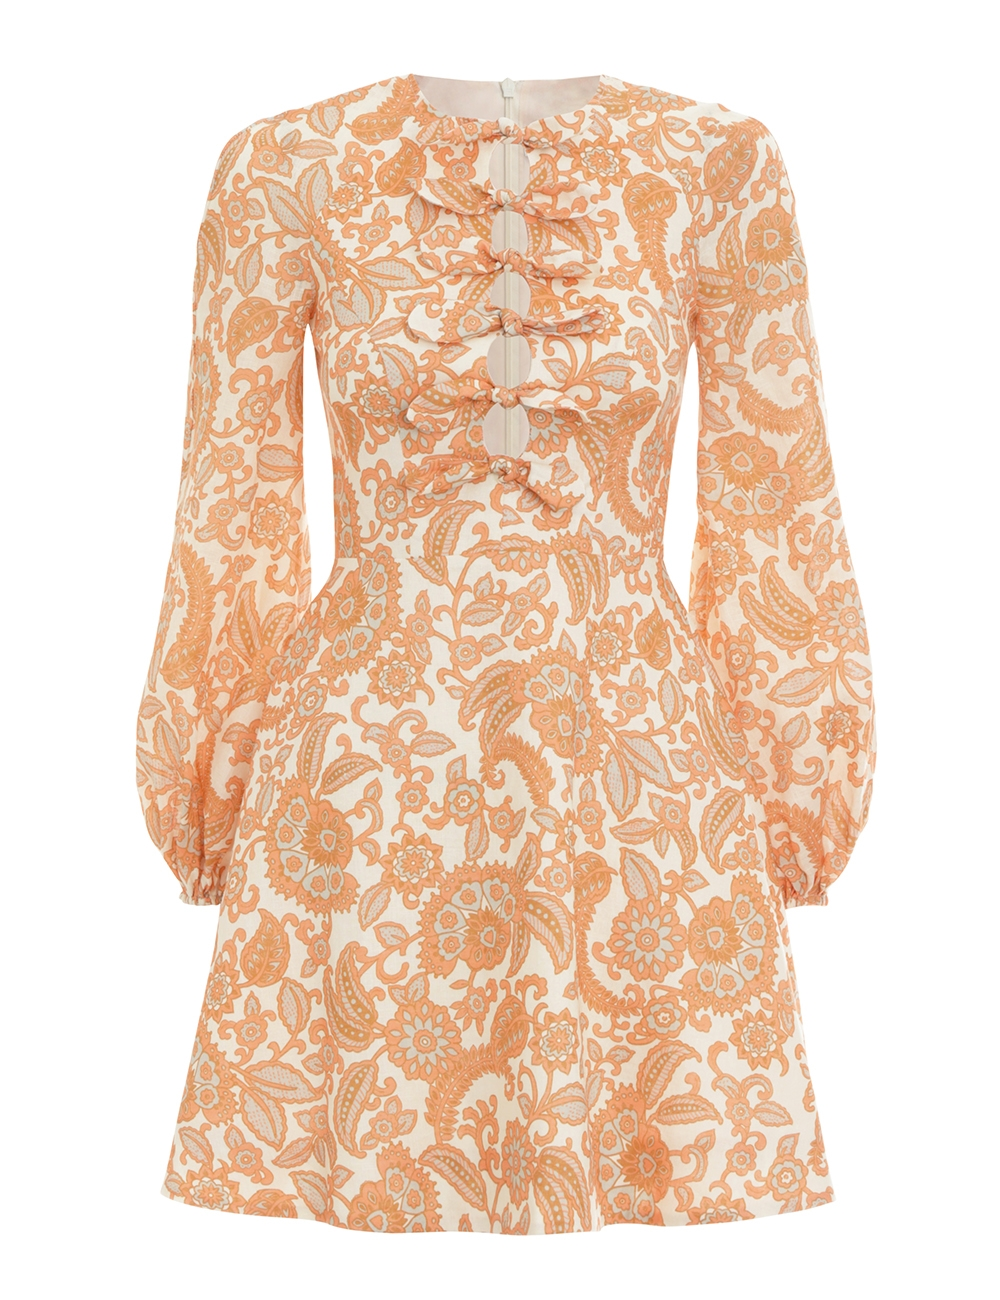 Peggy Scallop Short Dress Orange Paisley Online Zimmermann